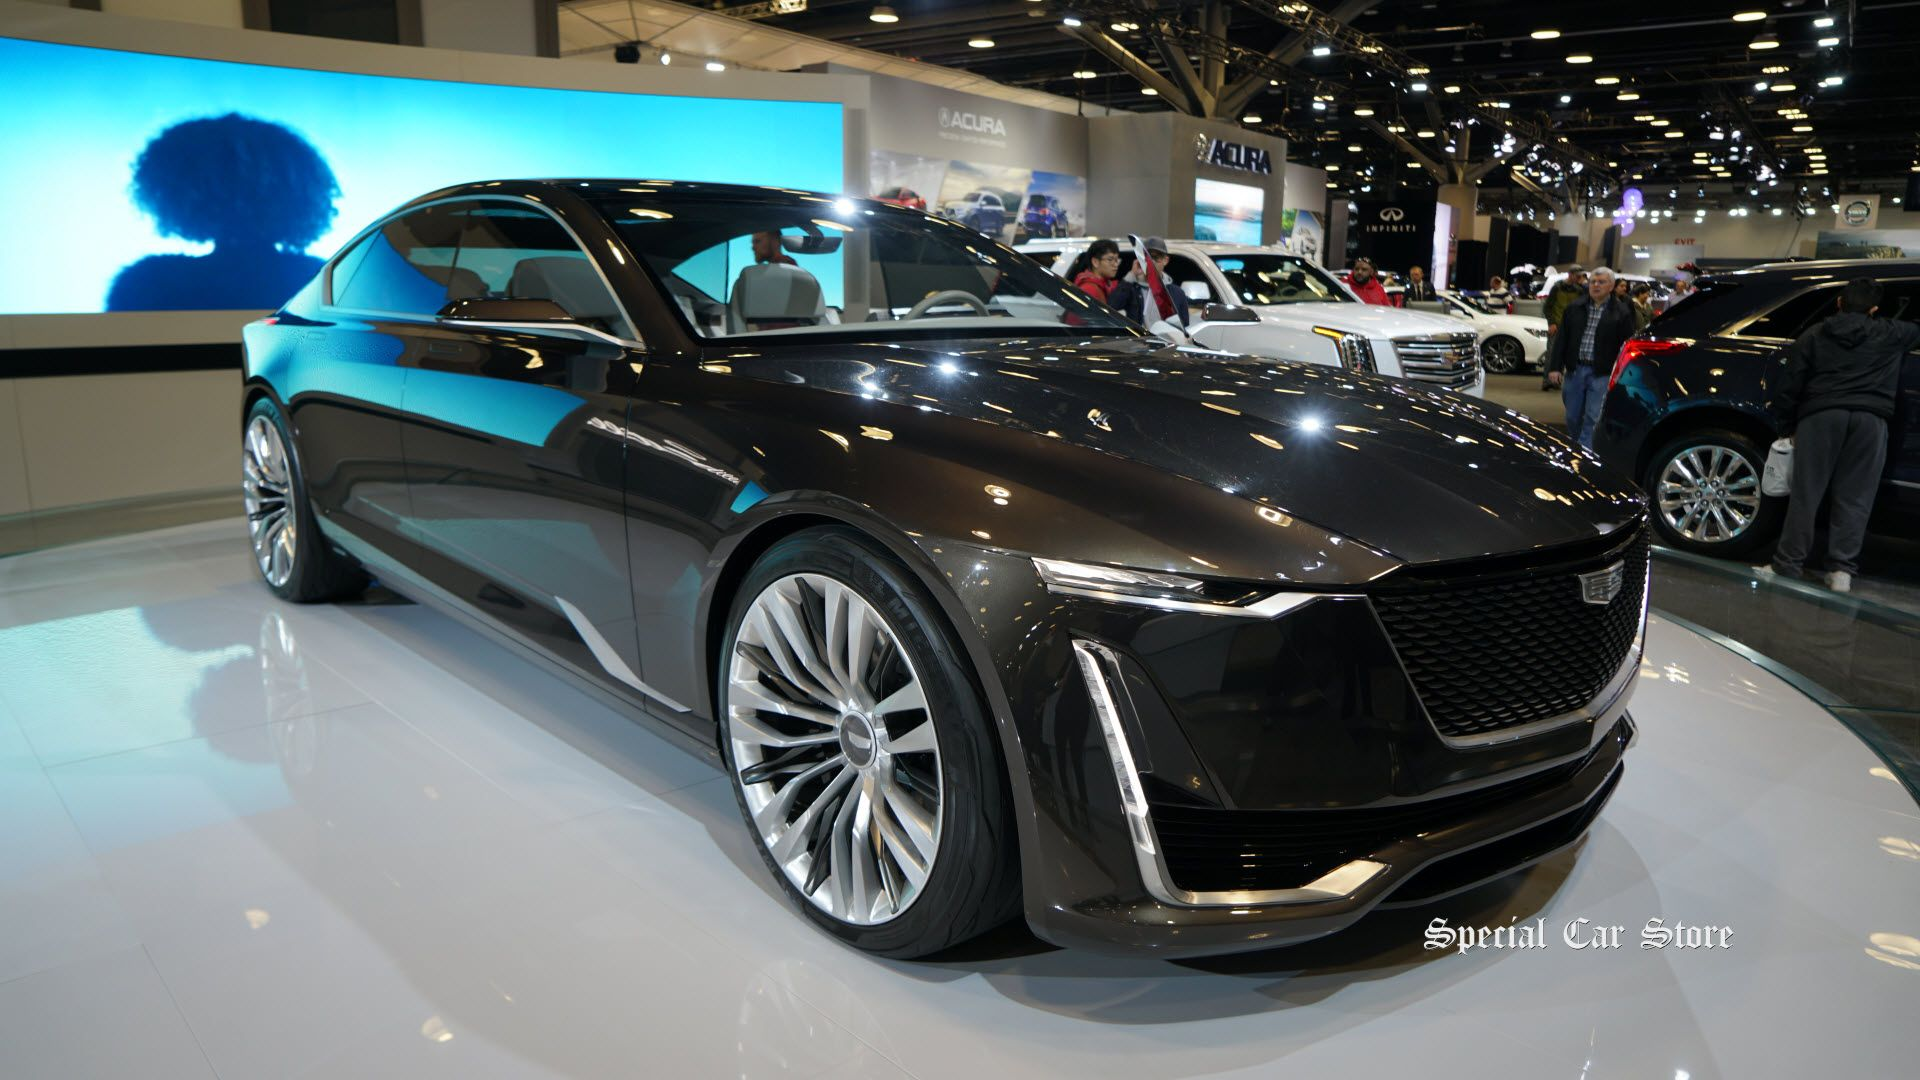 Cadillac Escala Concept At Vancouver International Auto Show - Car show vancouver 2018